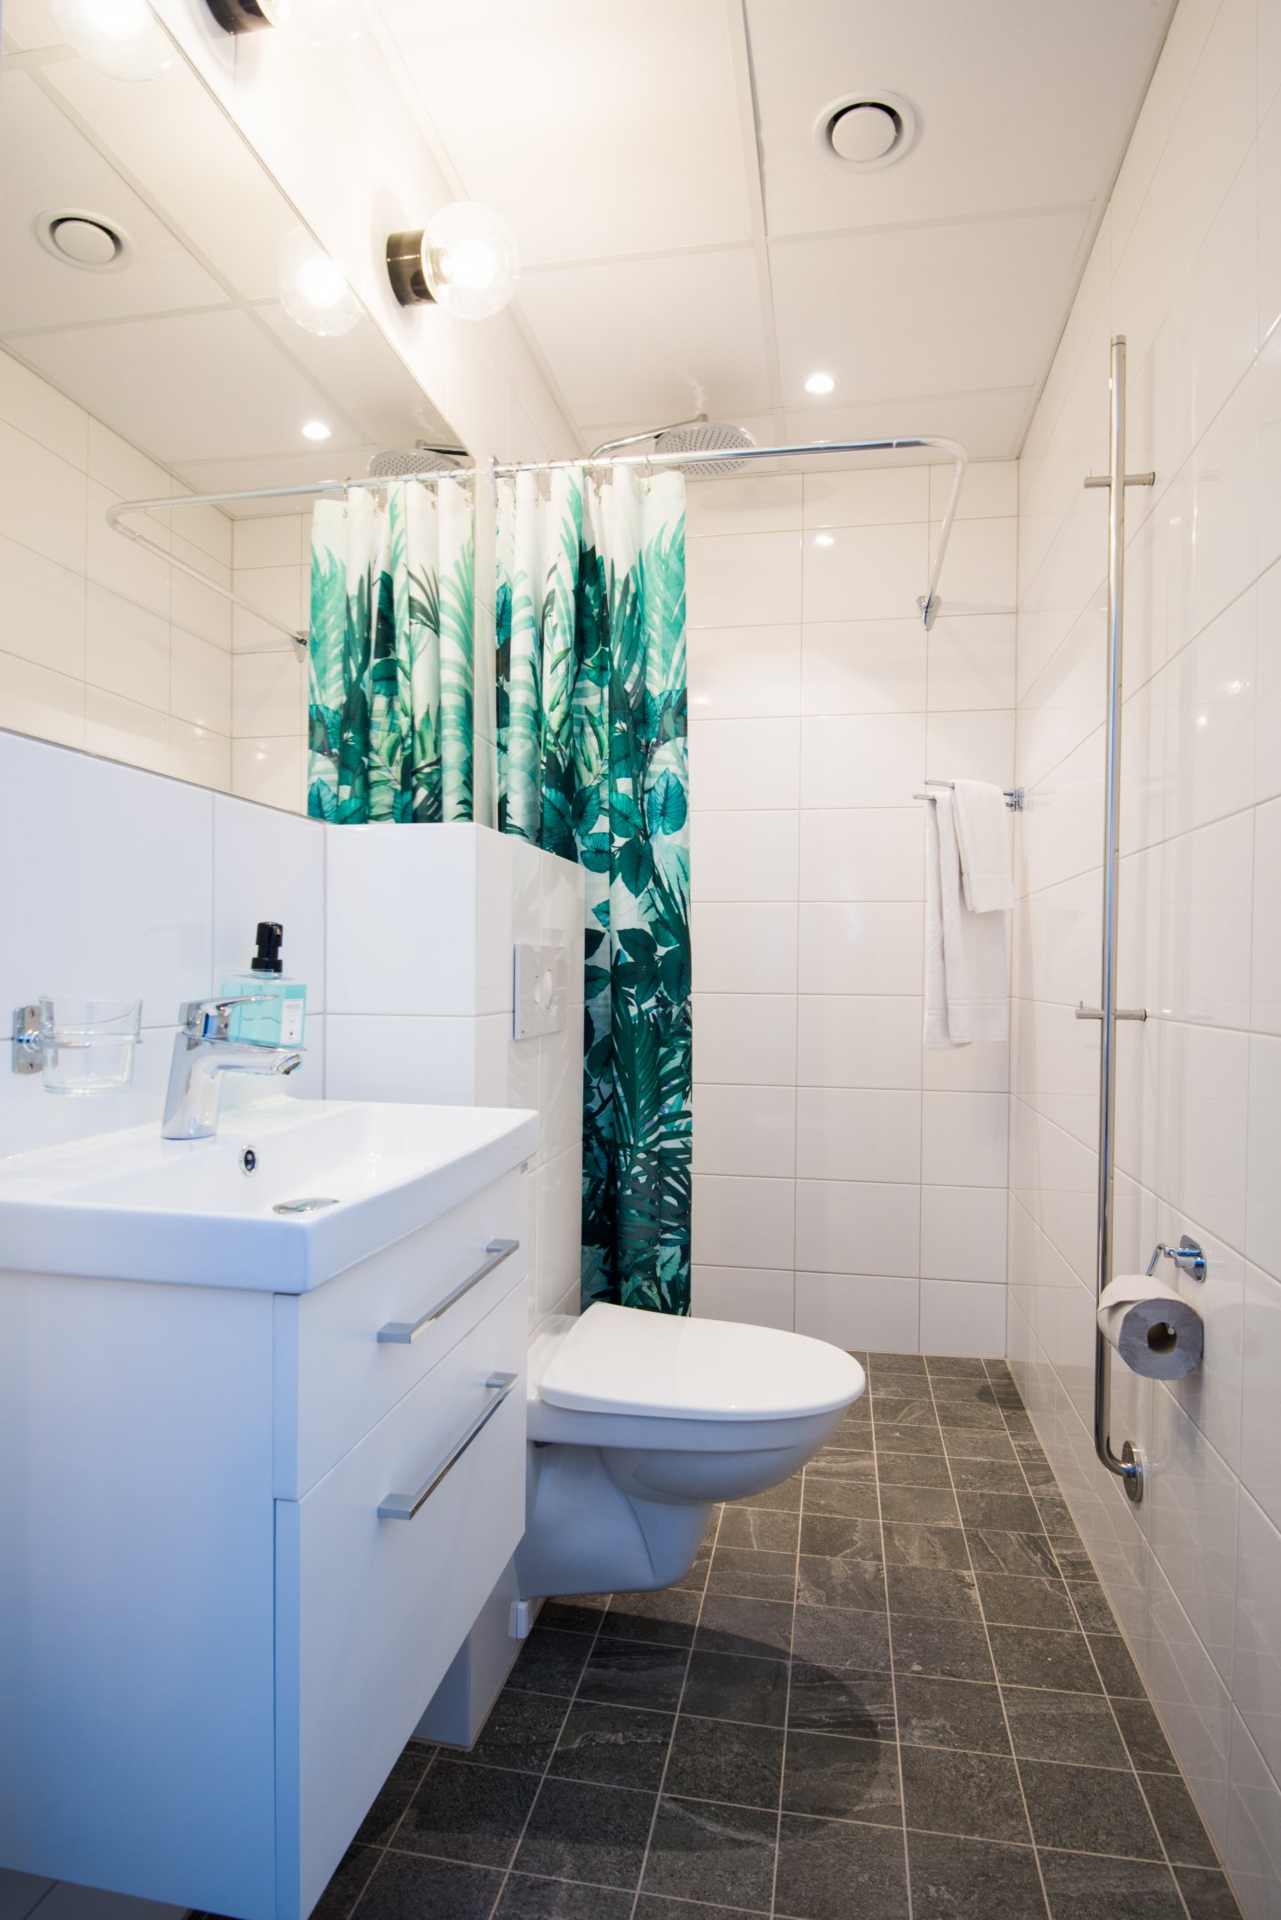 Bathroom at Voltavagen Apartment - Citybase Apartments